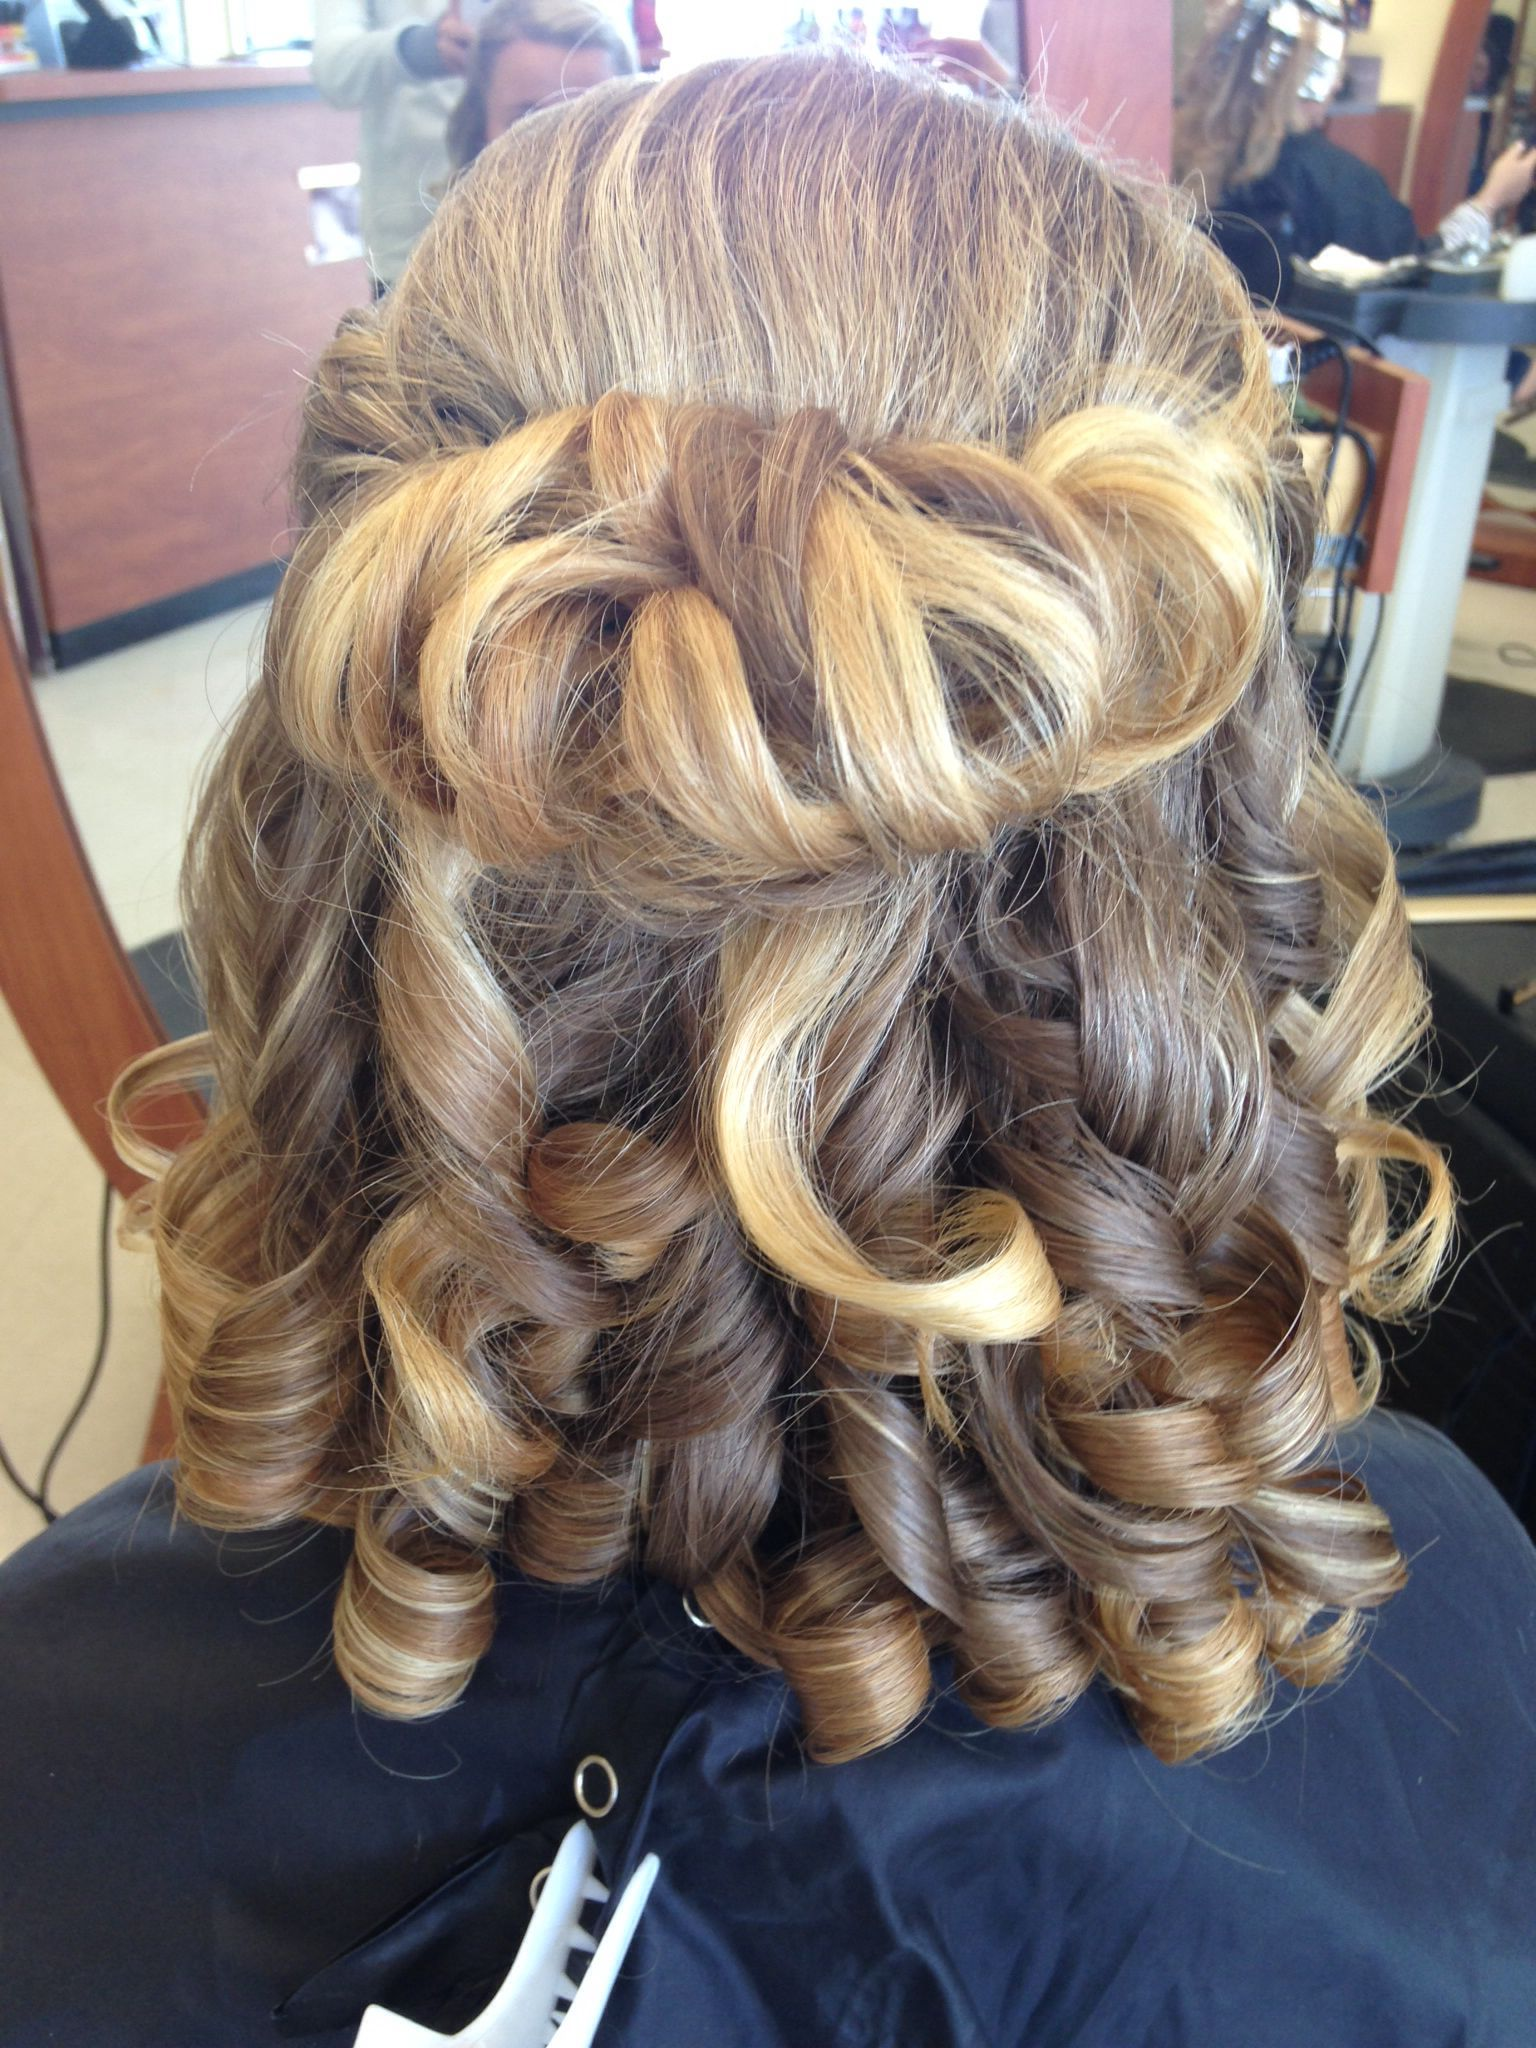 Prom hair for medium length hair | Hair lengths, Medium ...